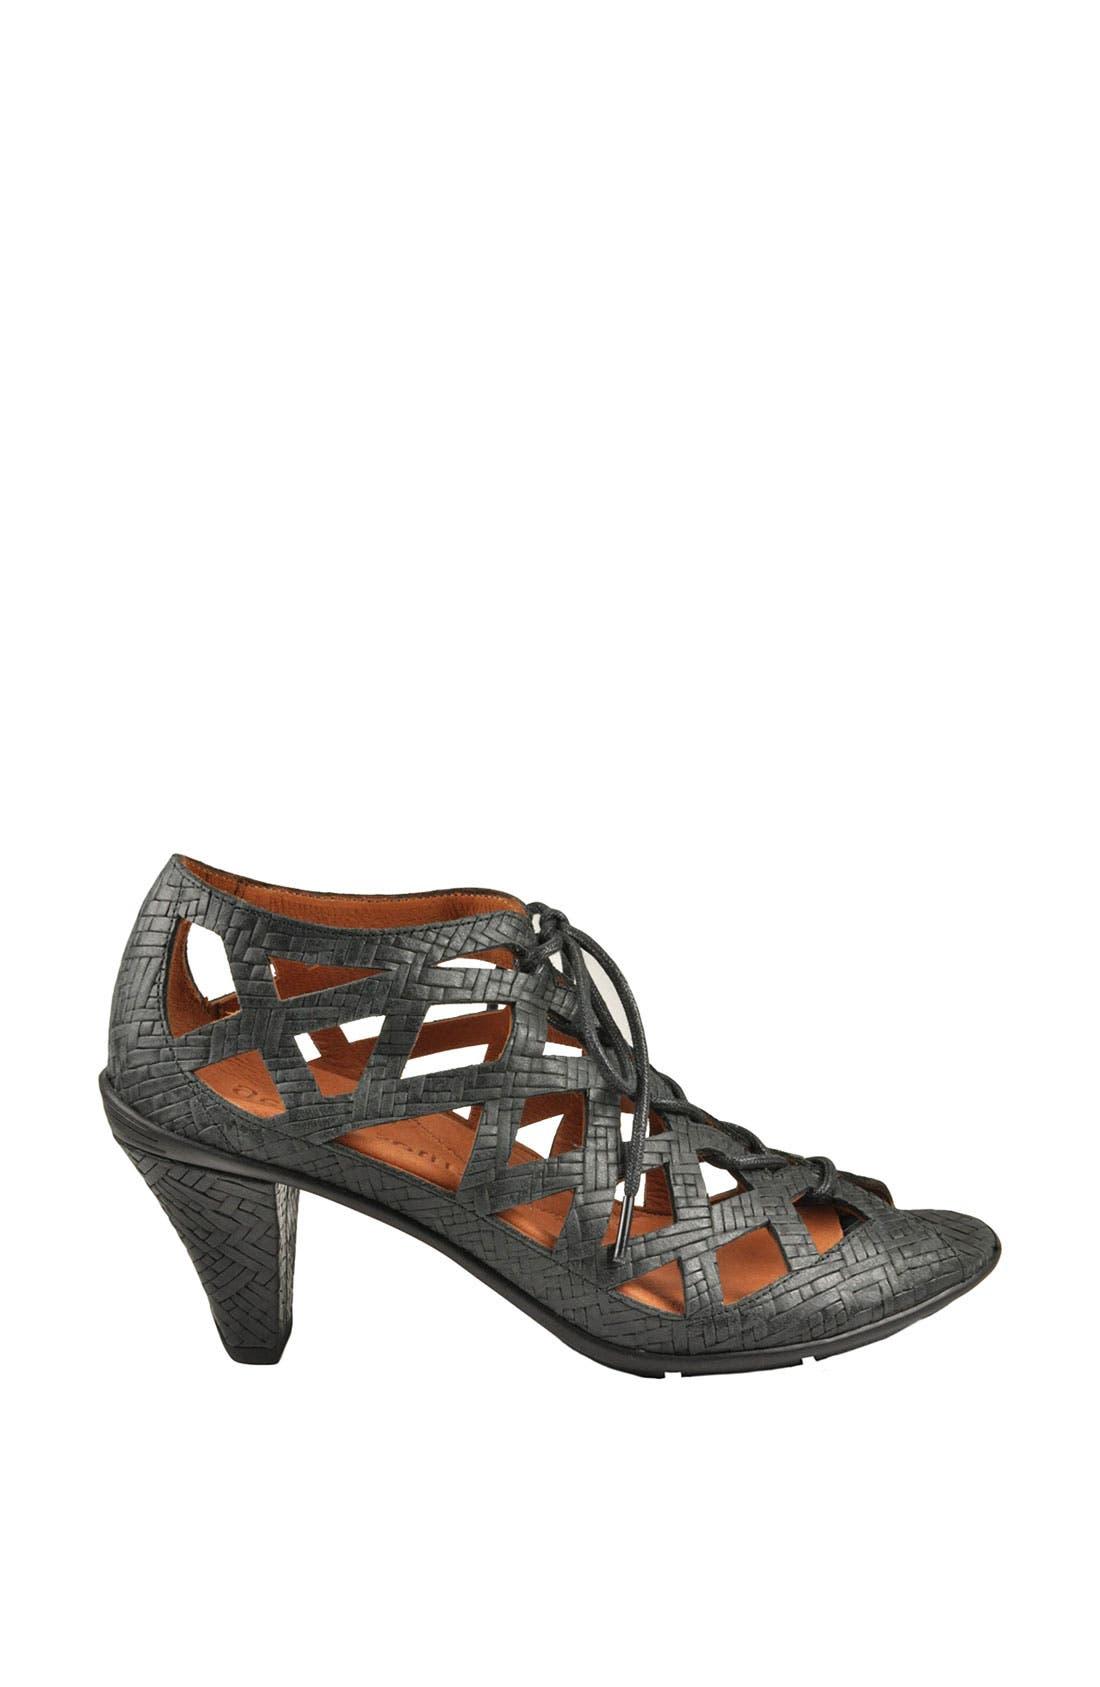 'Okey Dokey' Sandal,                         Main,                         color, 001